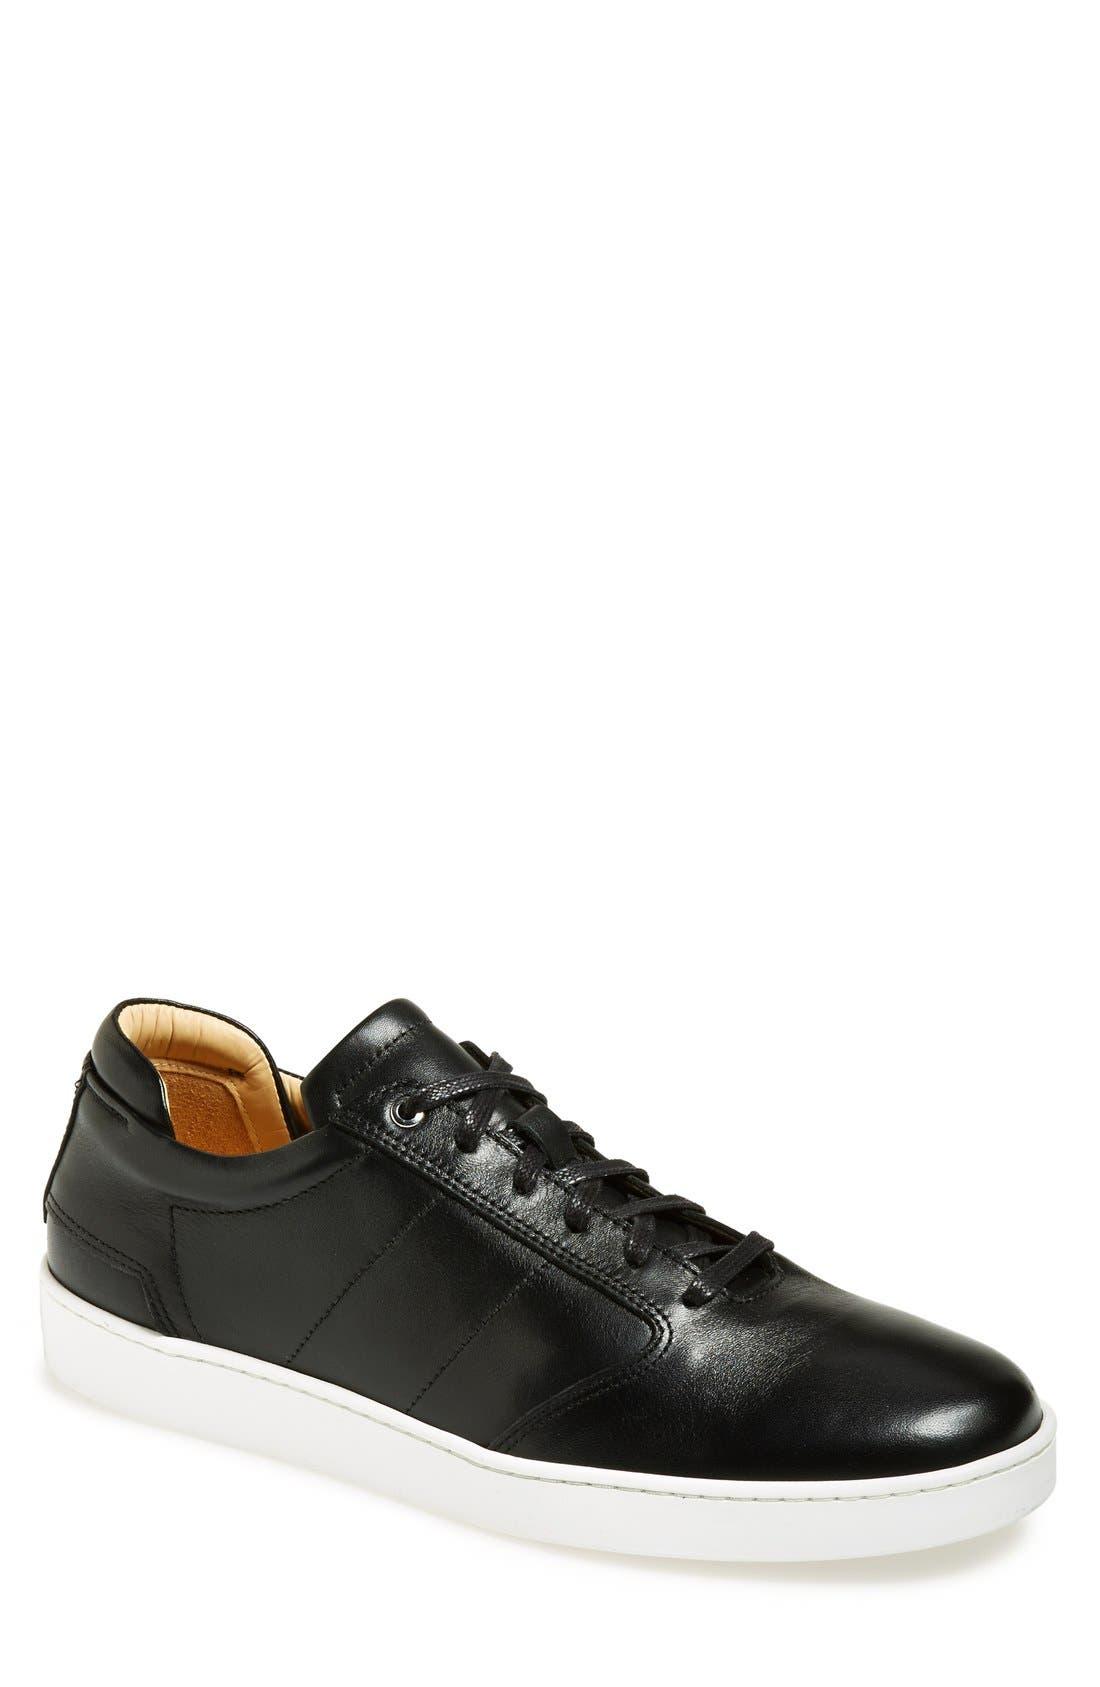 'Lennon' Sneaker,                             Main thumbnail 1, color,                             005